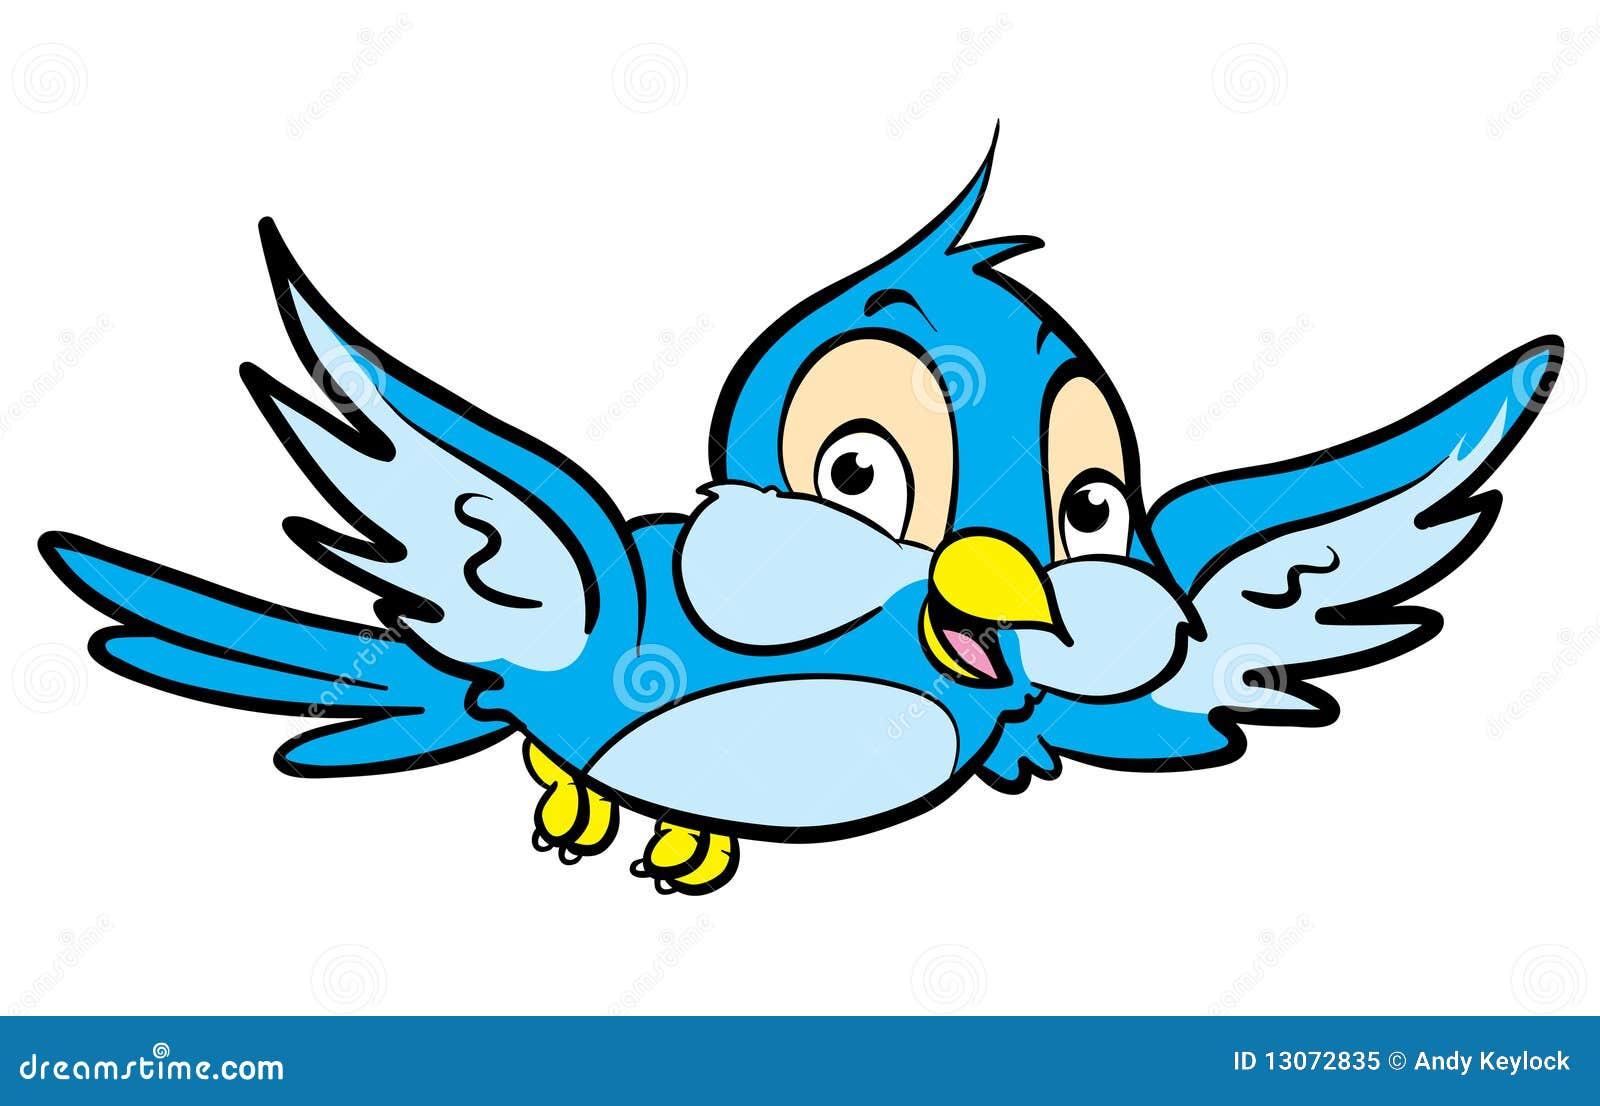 Karikatur-Vogel